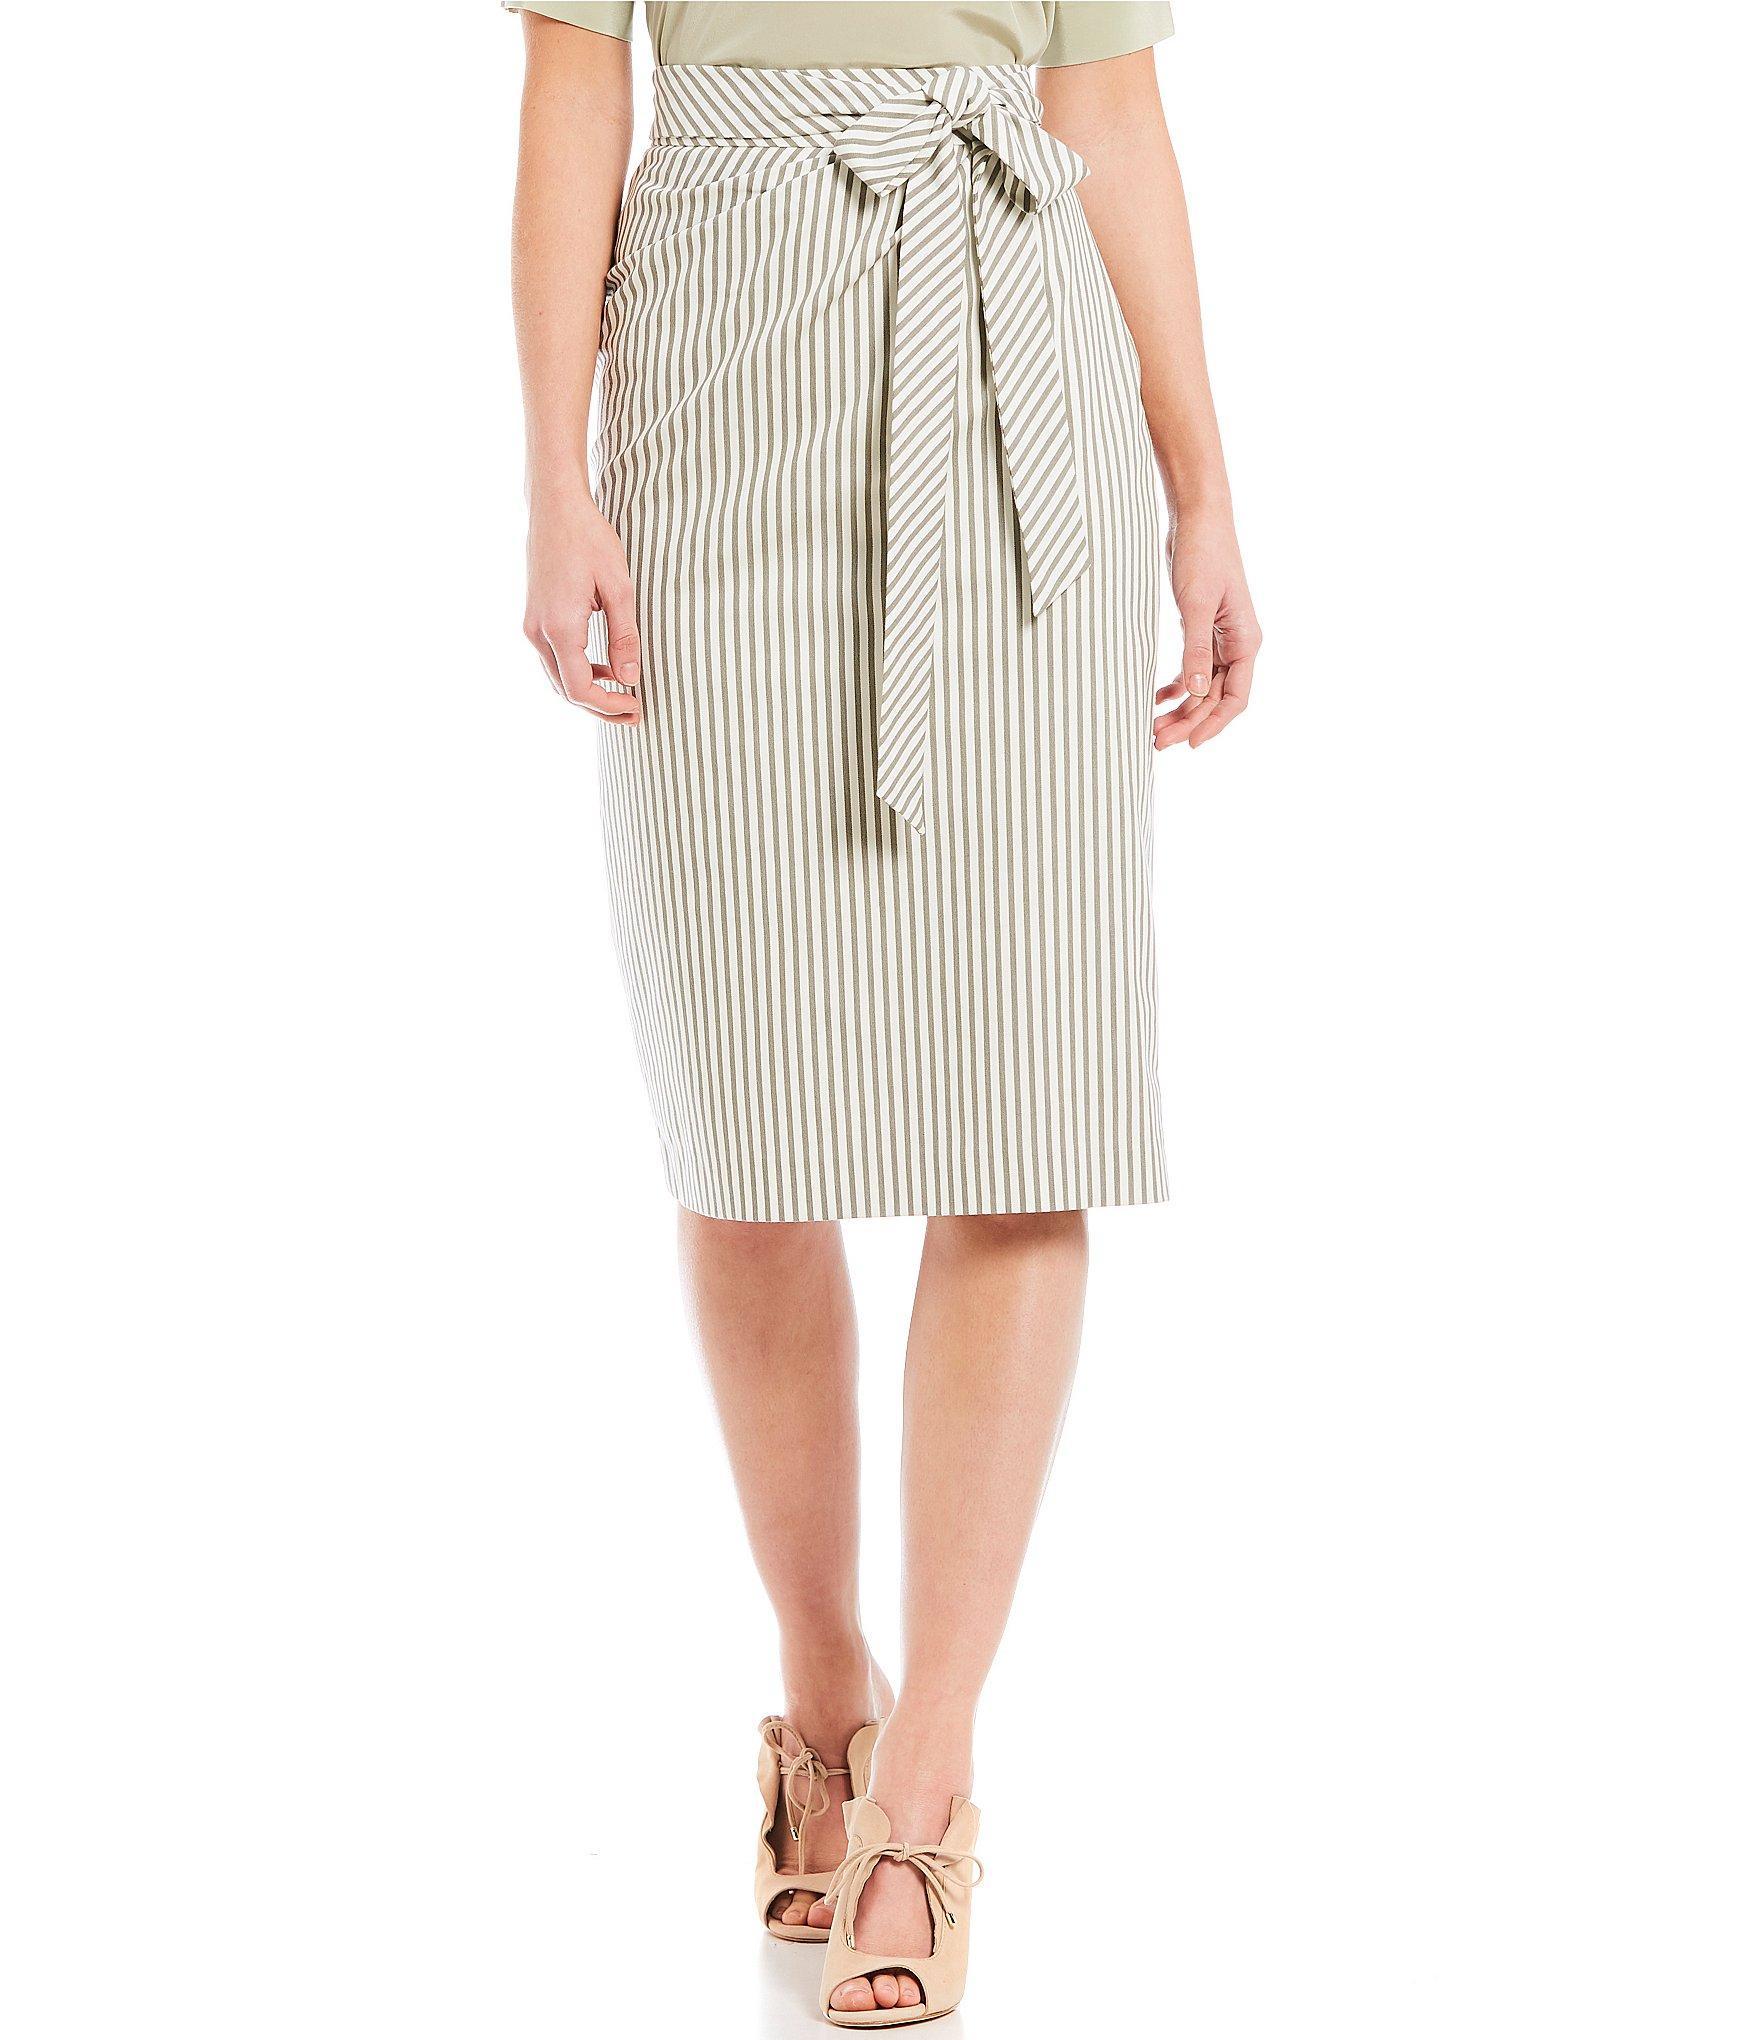 3f0e74427f Antonio Melani. Women's White Parma Striped Tie Waist Midi Length Pencil  Skirt